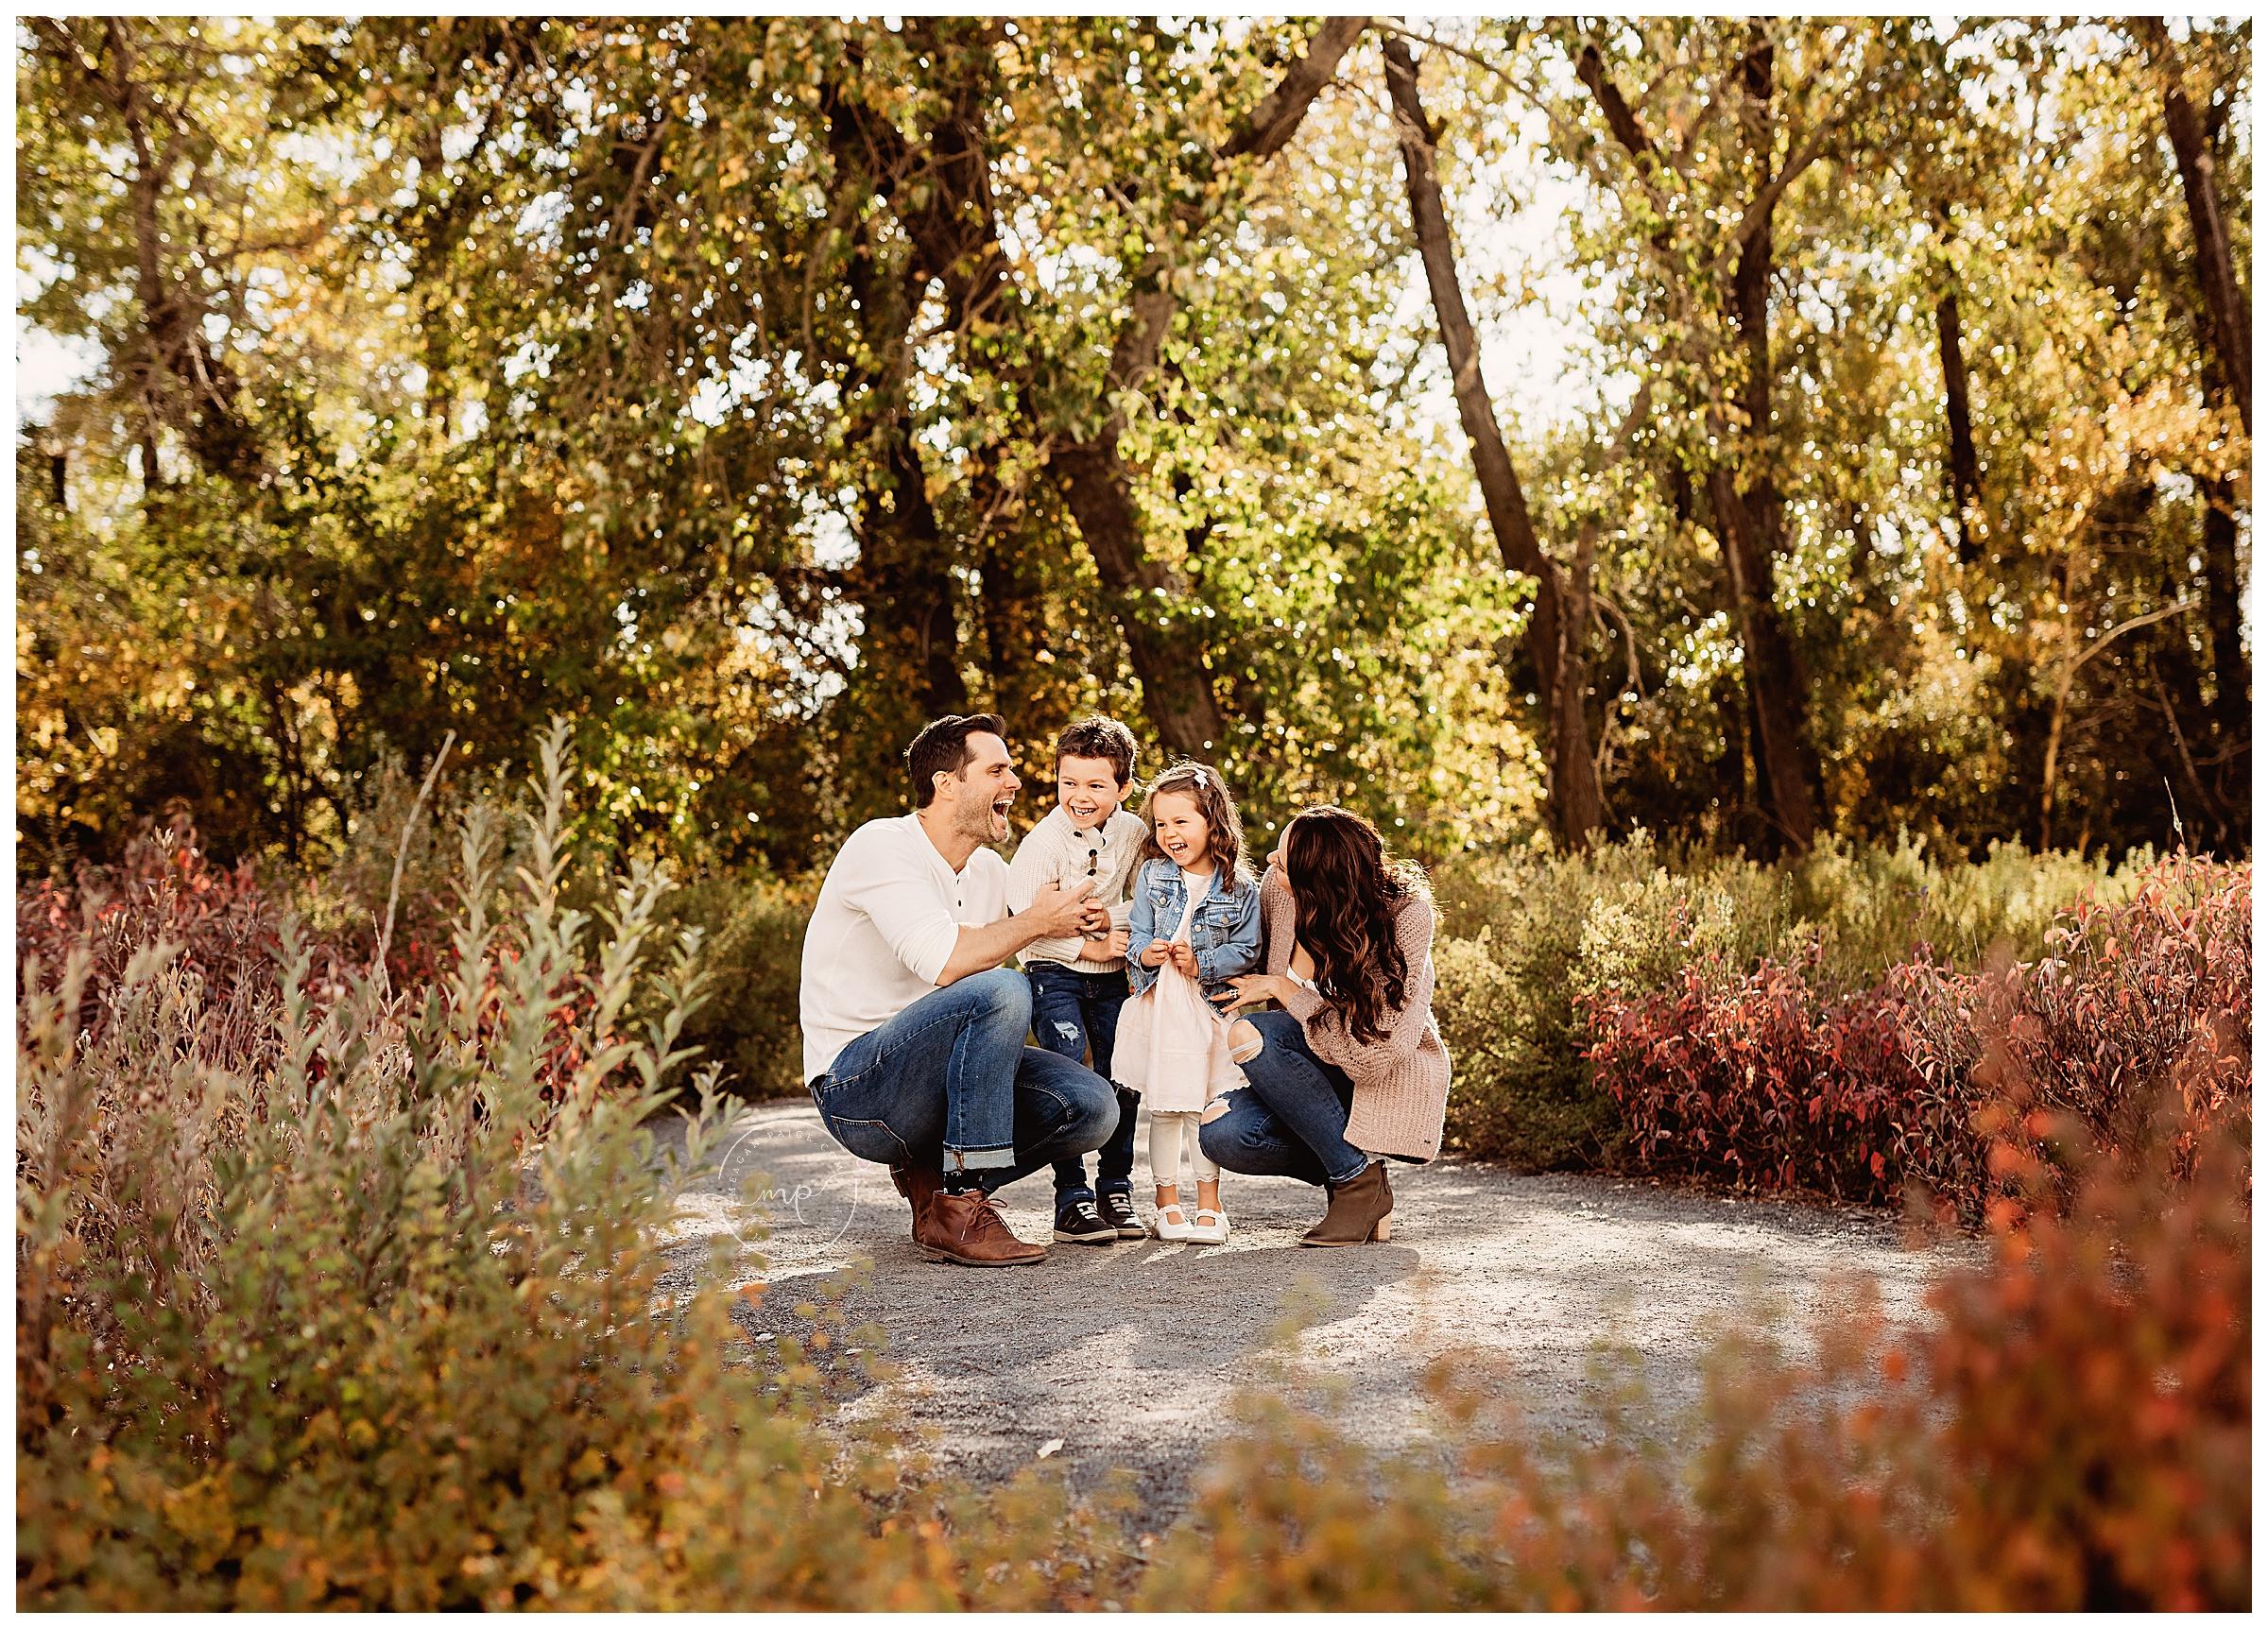 Pearce Estate Park - Fall Family Mini Session - Meagan Paige Photography - Calgary